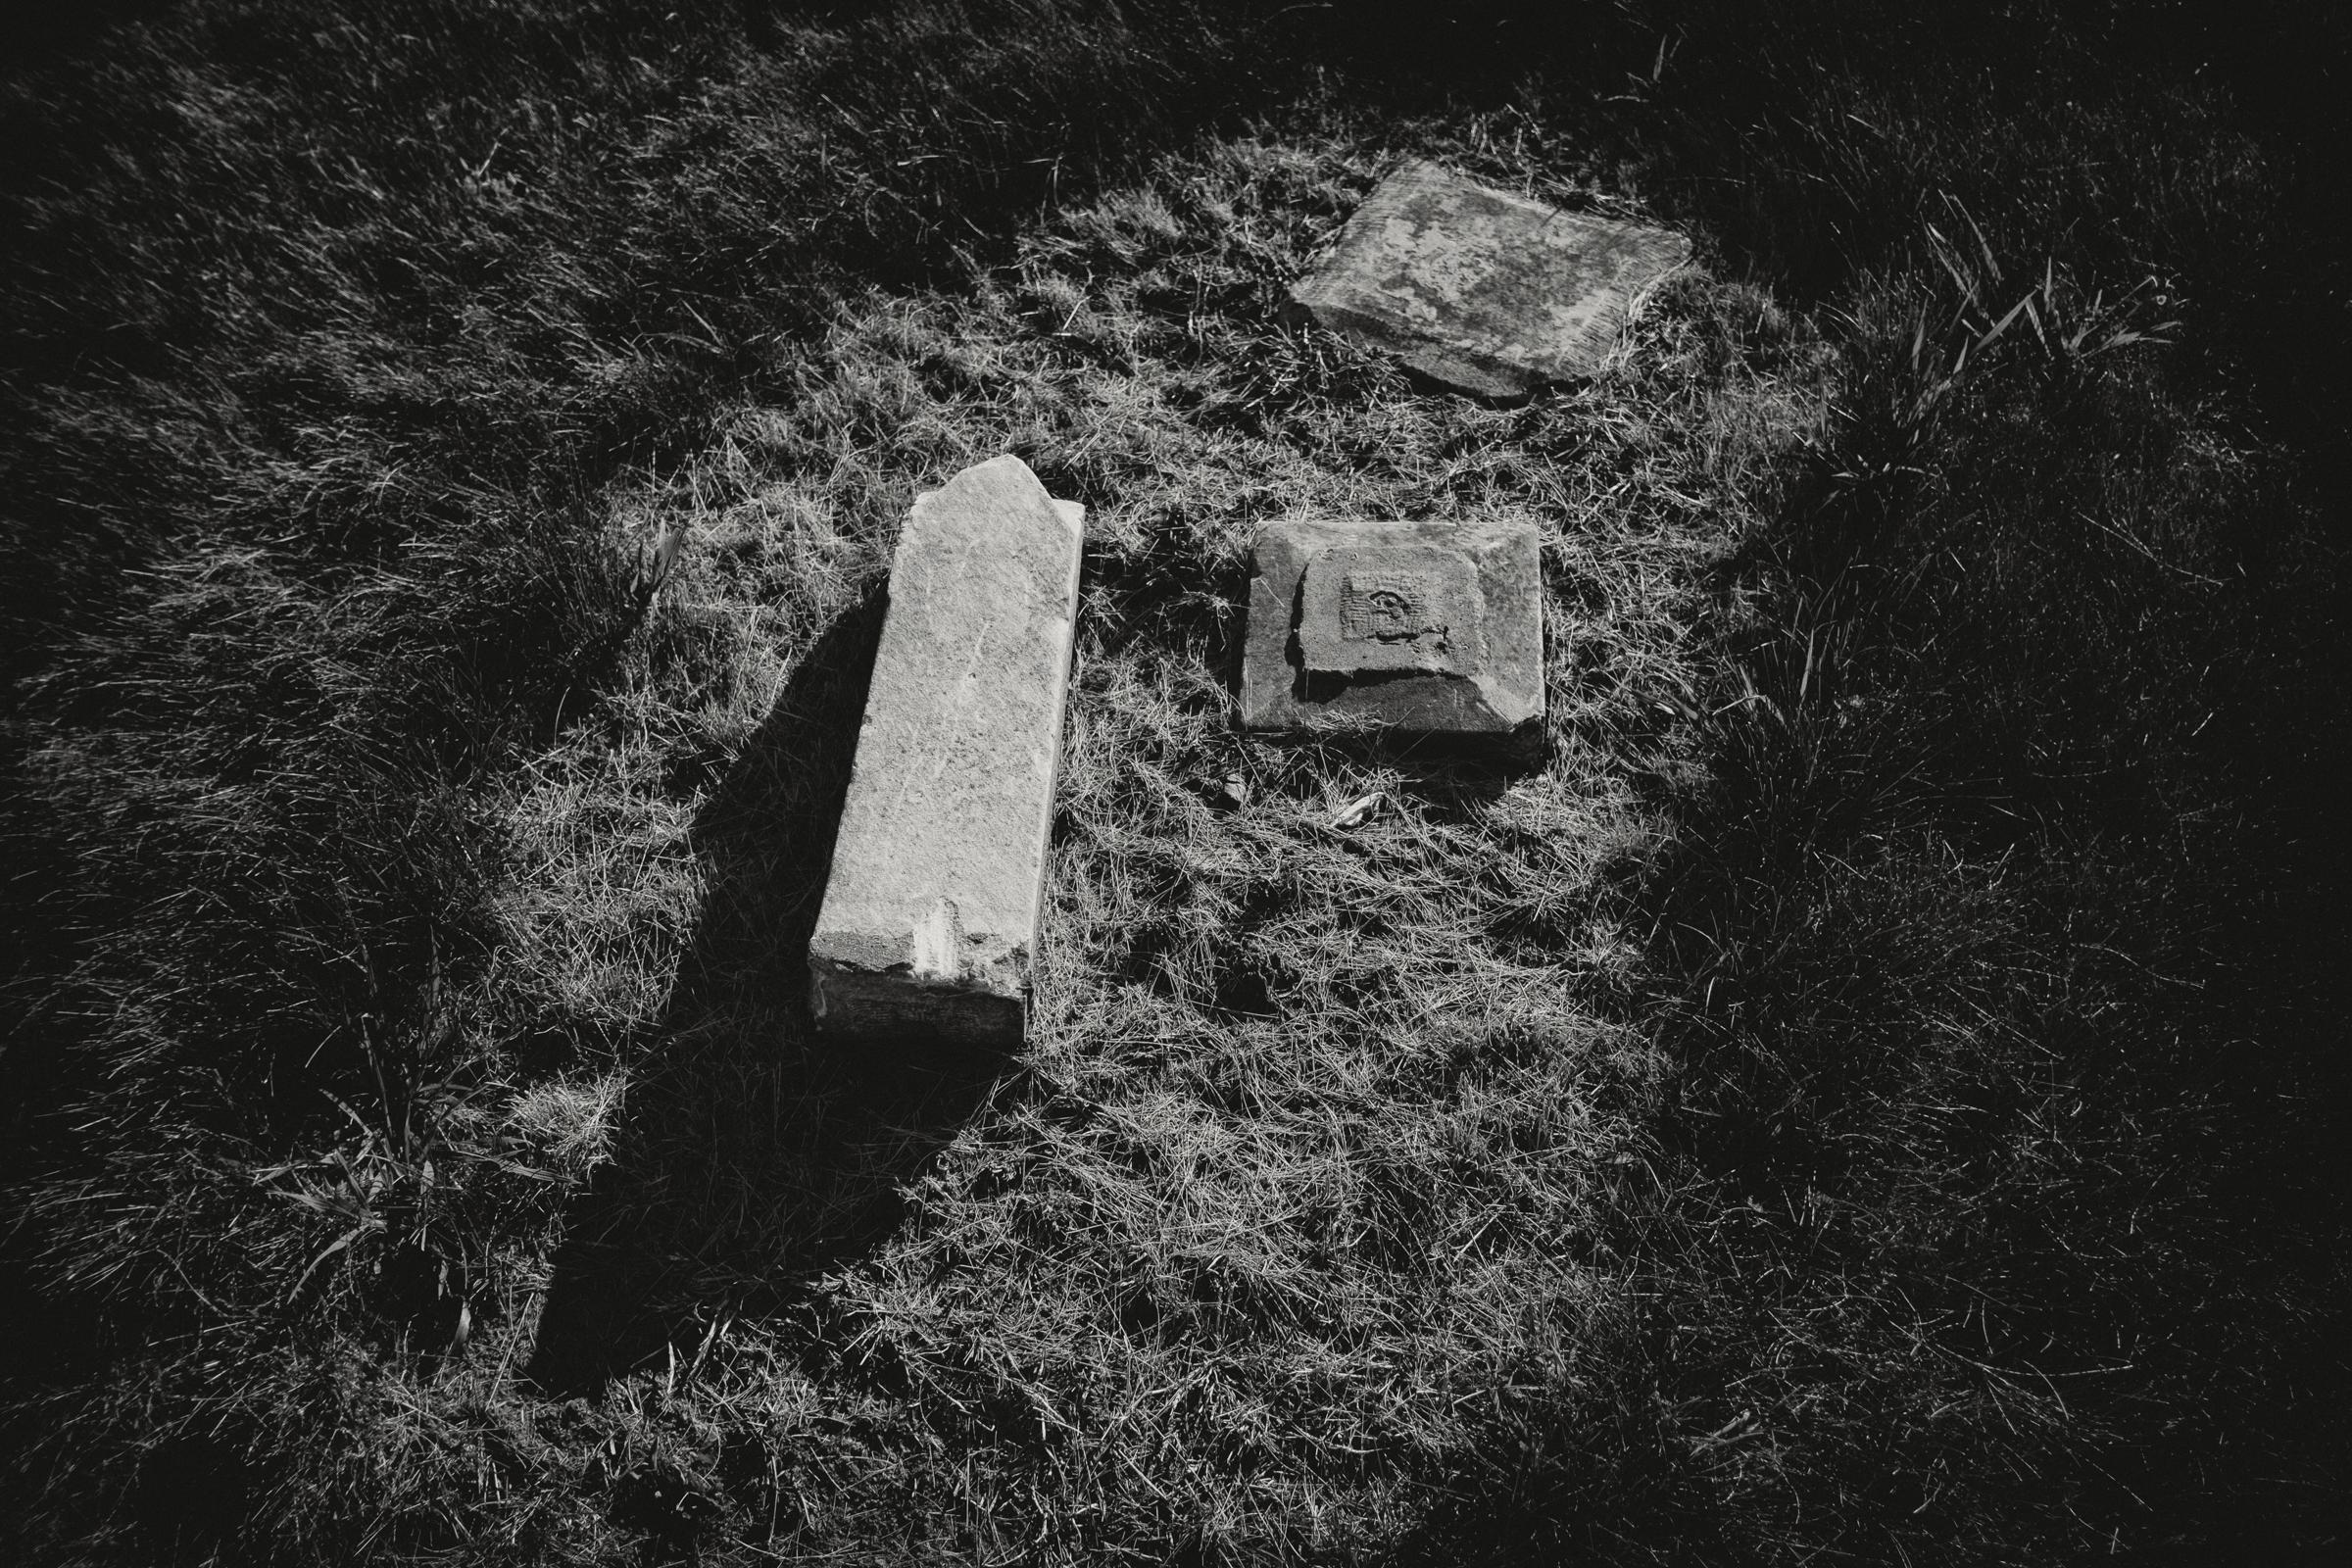 Sunbridge (City) Cemetery, Missouri, 2018